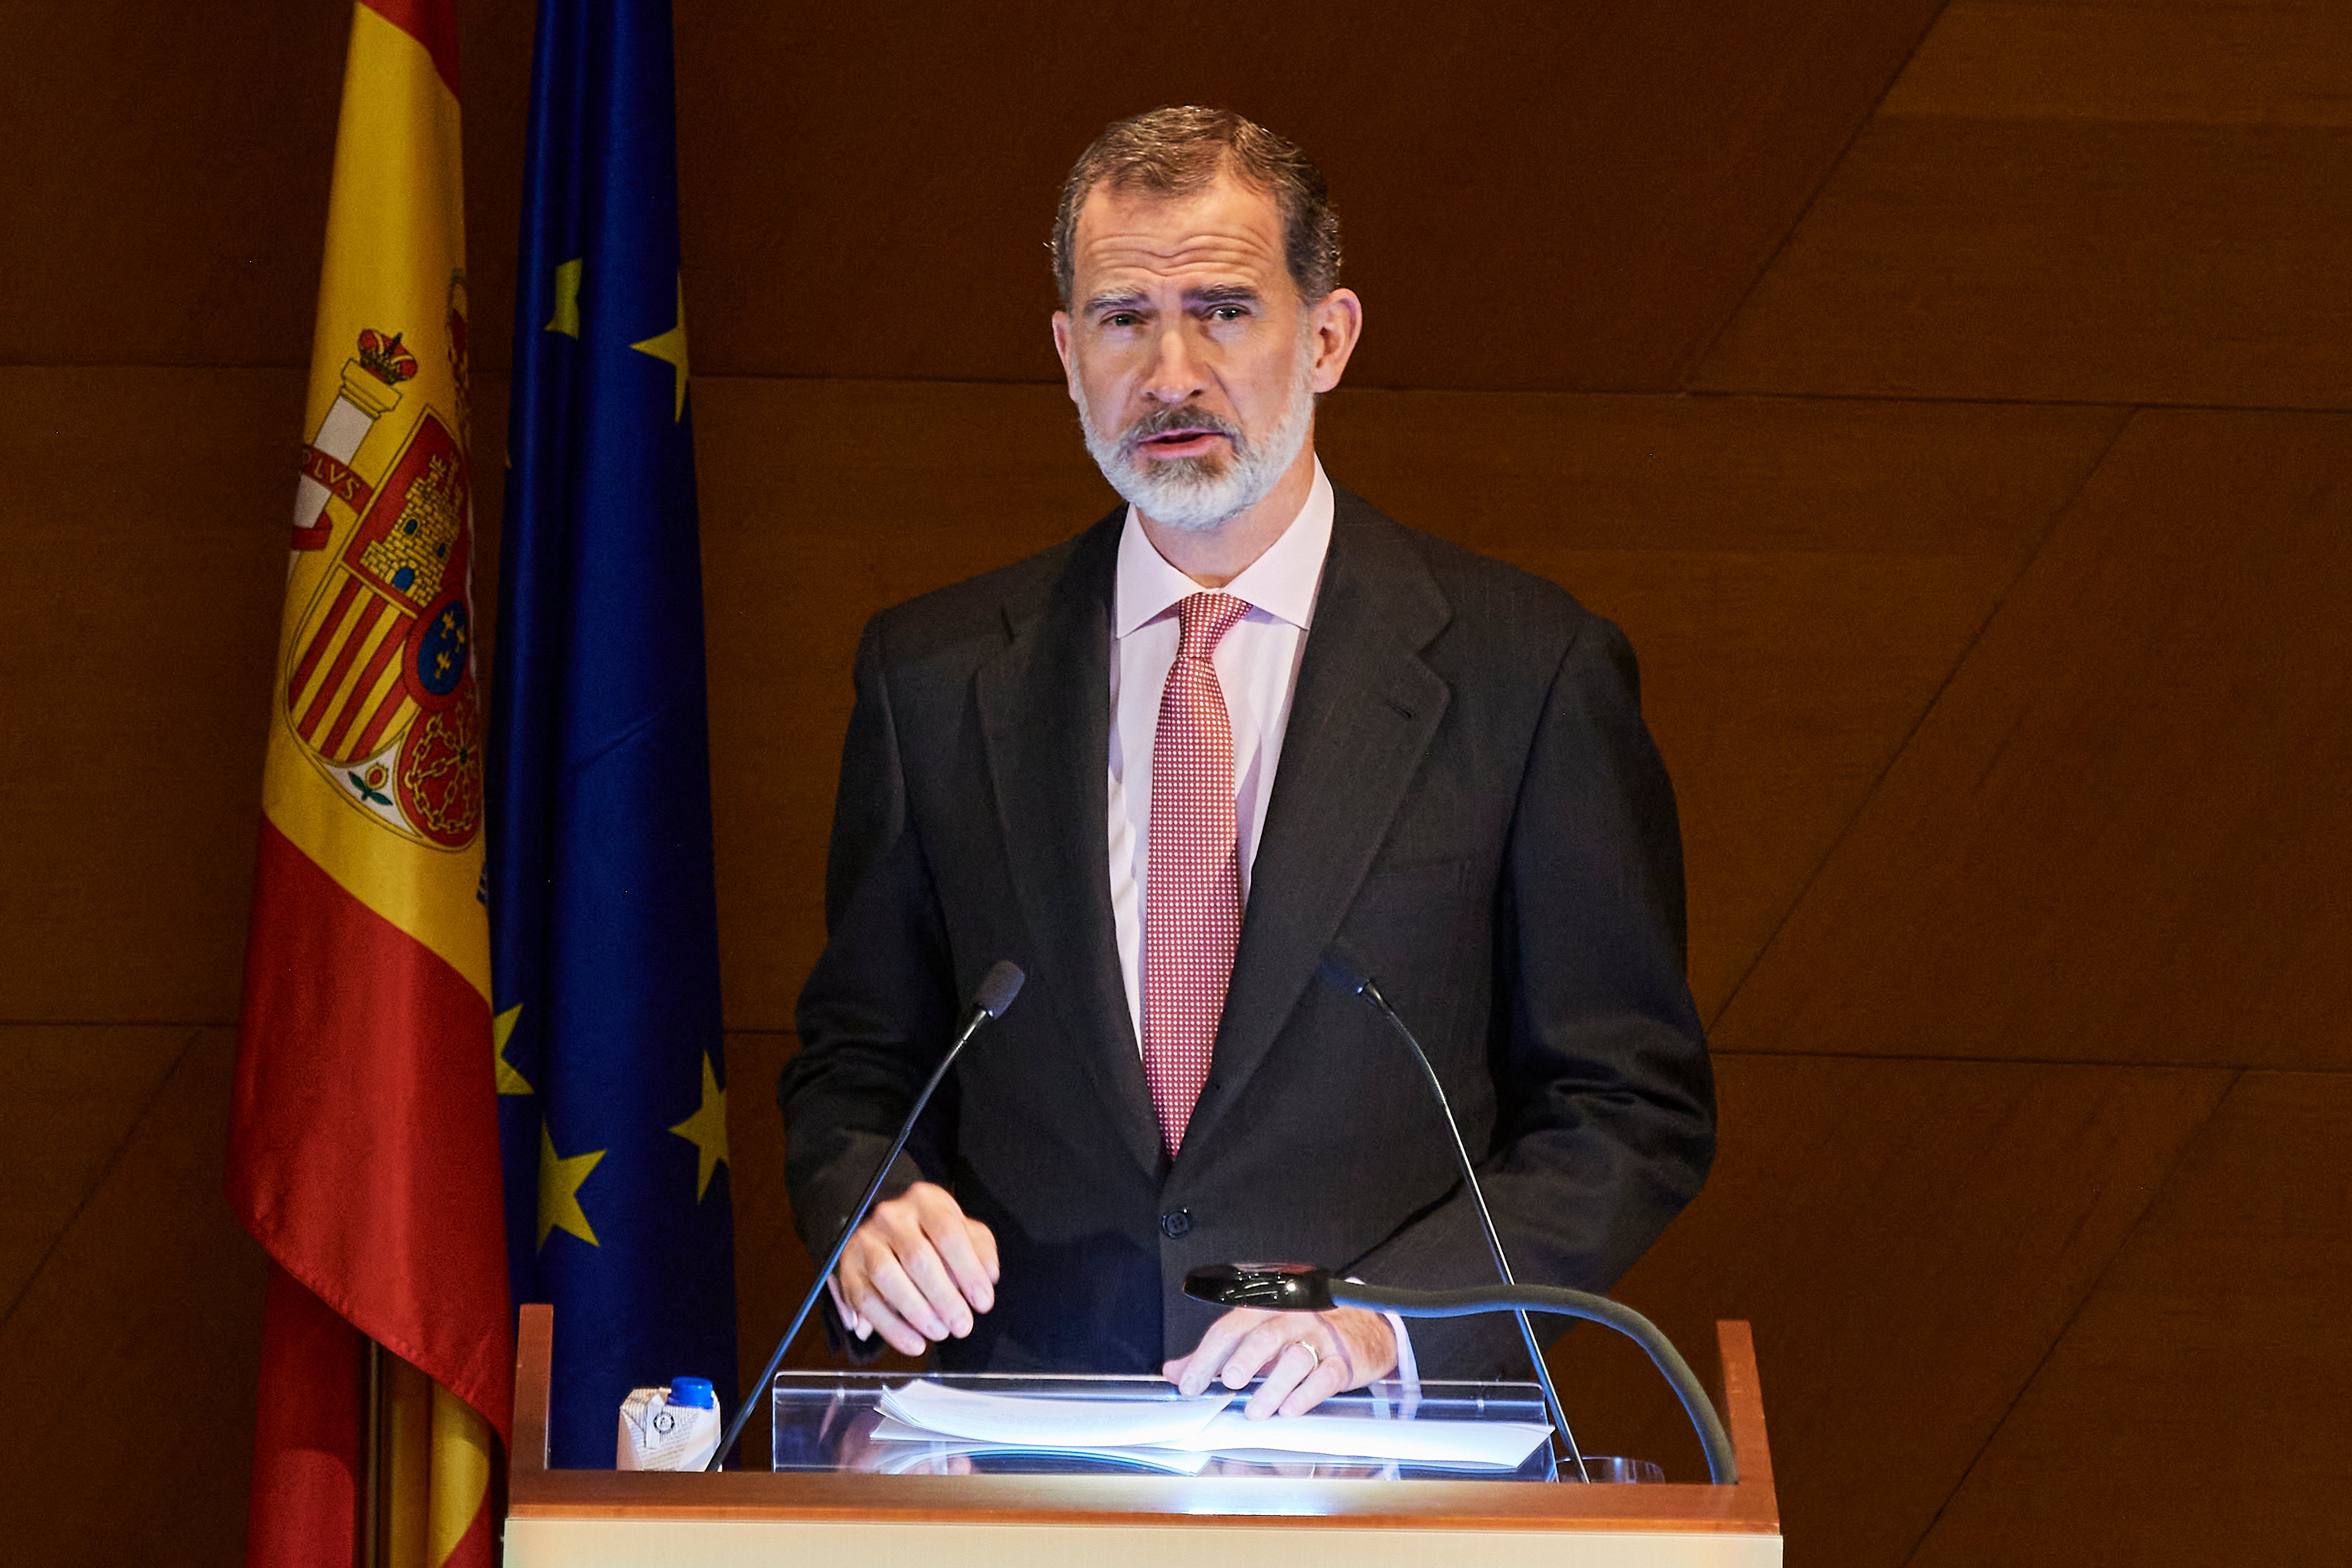 Spain's King Felipe in quarantine after Covid exposure